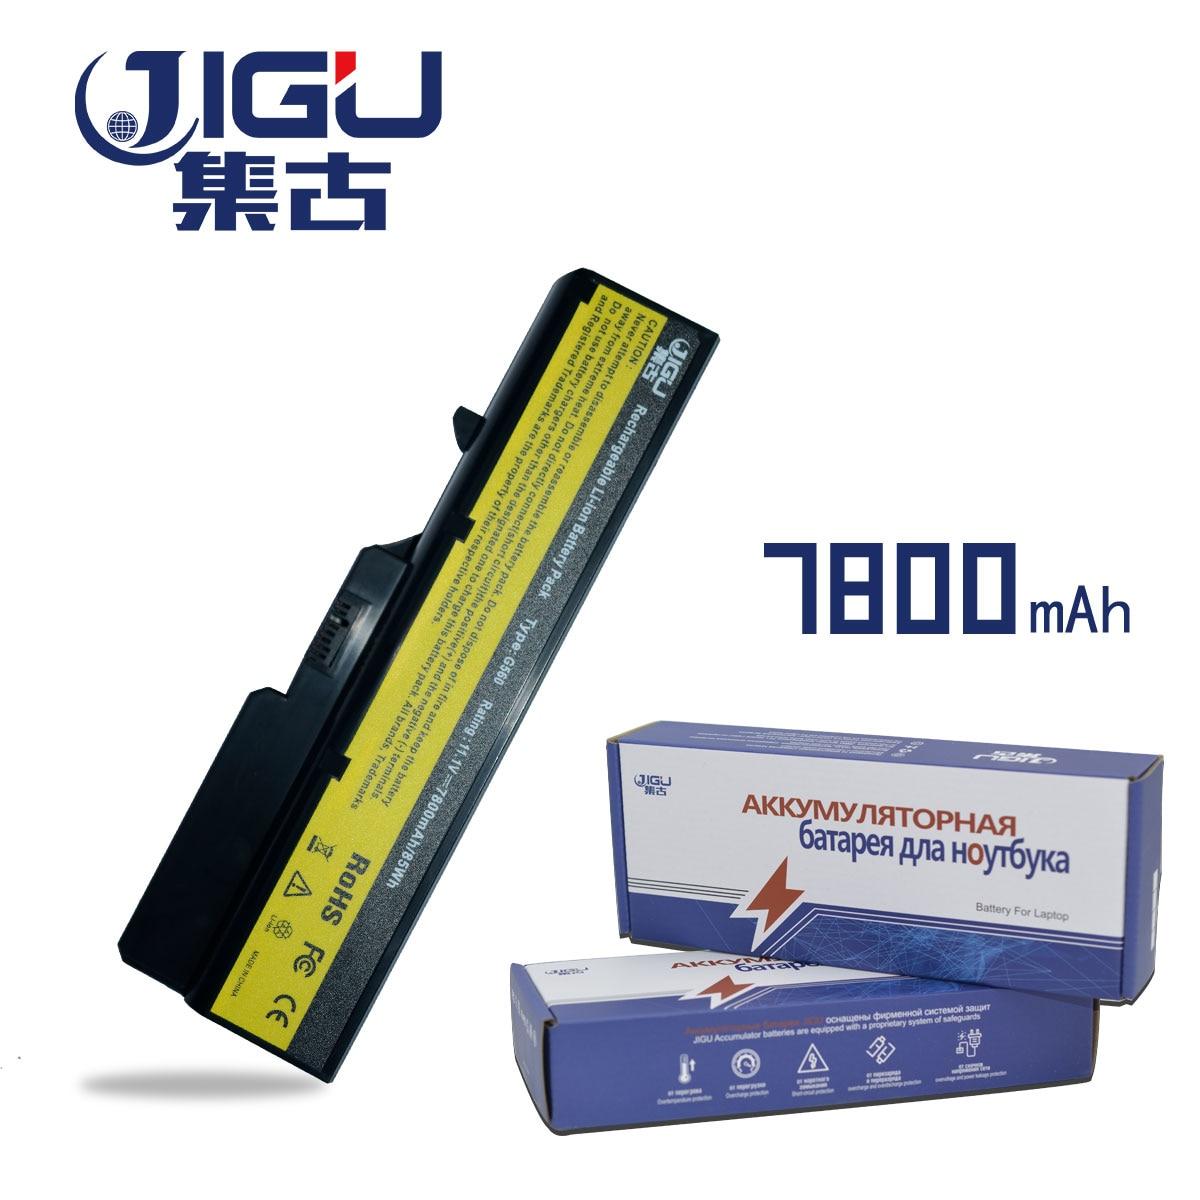 JIGU Latpop Bateria Para Lenovo Para L09L6Y02 L09N6Y02 L09S6Y02 L10C6Y02 L10M6F21 L10P6F21 L10P6Y22 57Y6454 IdeaPad G460L